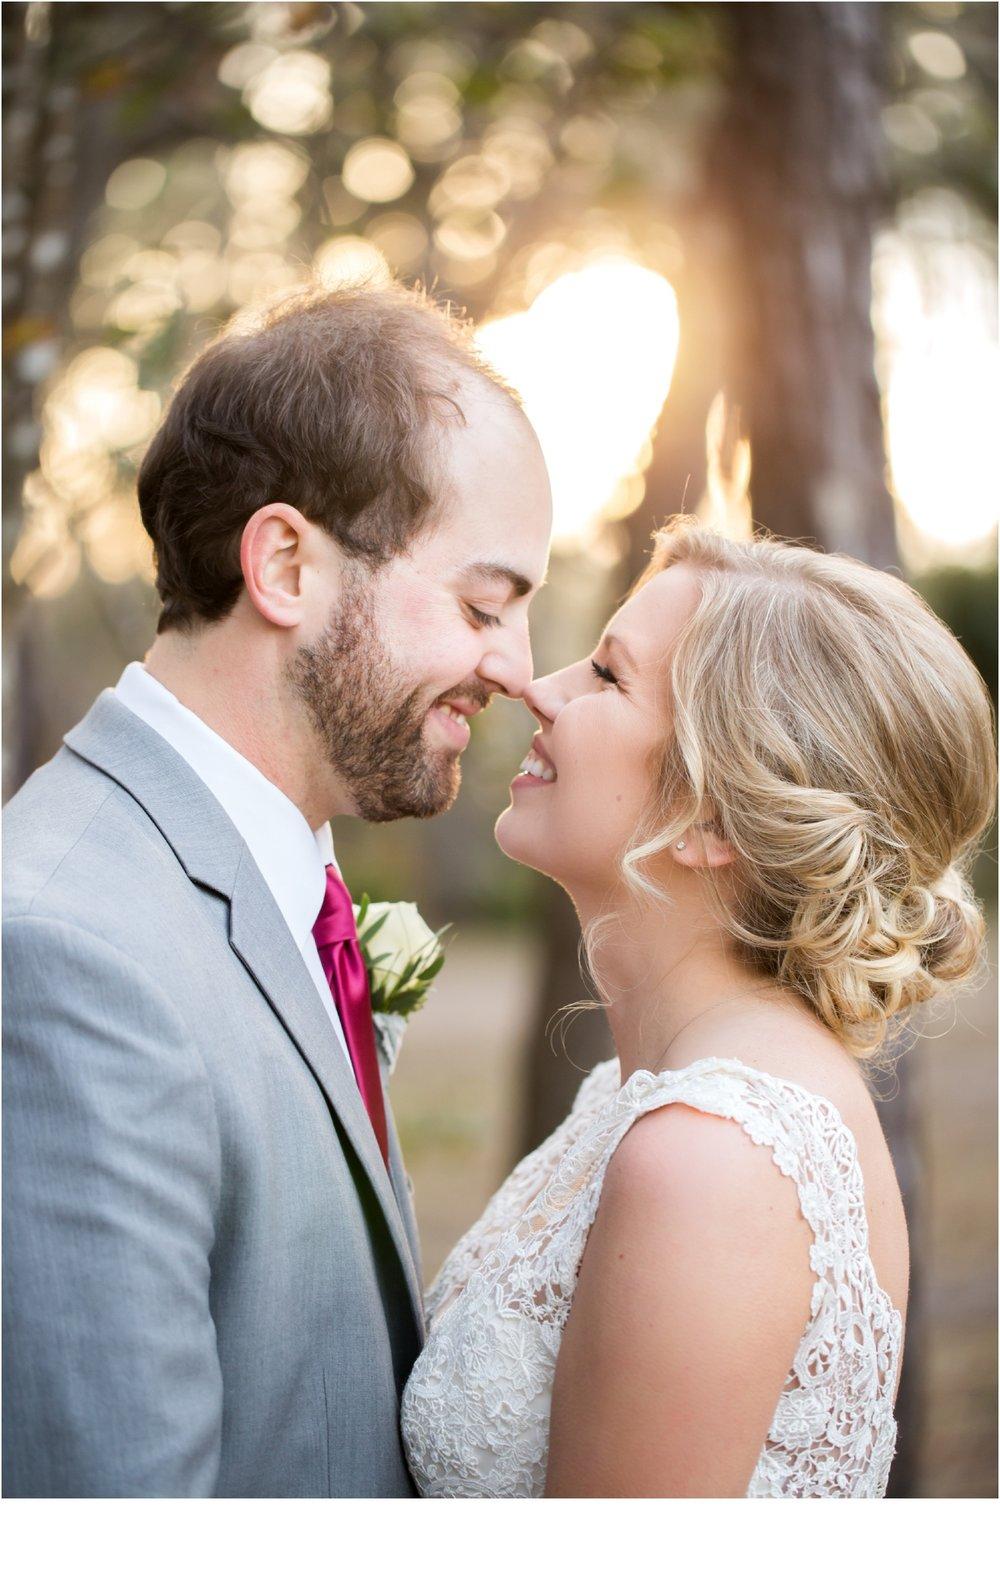 Rainey_Gregg_Photography_St._Simons_Island_Georgia_California_Wedding_Portrait_Photography_0509.jpg